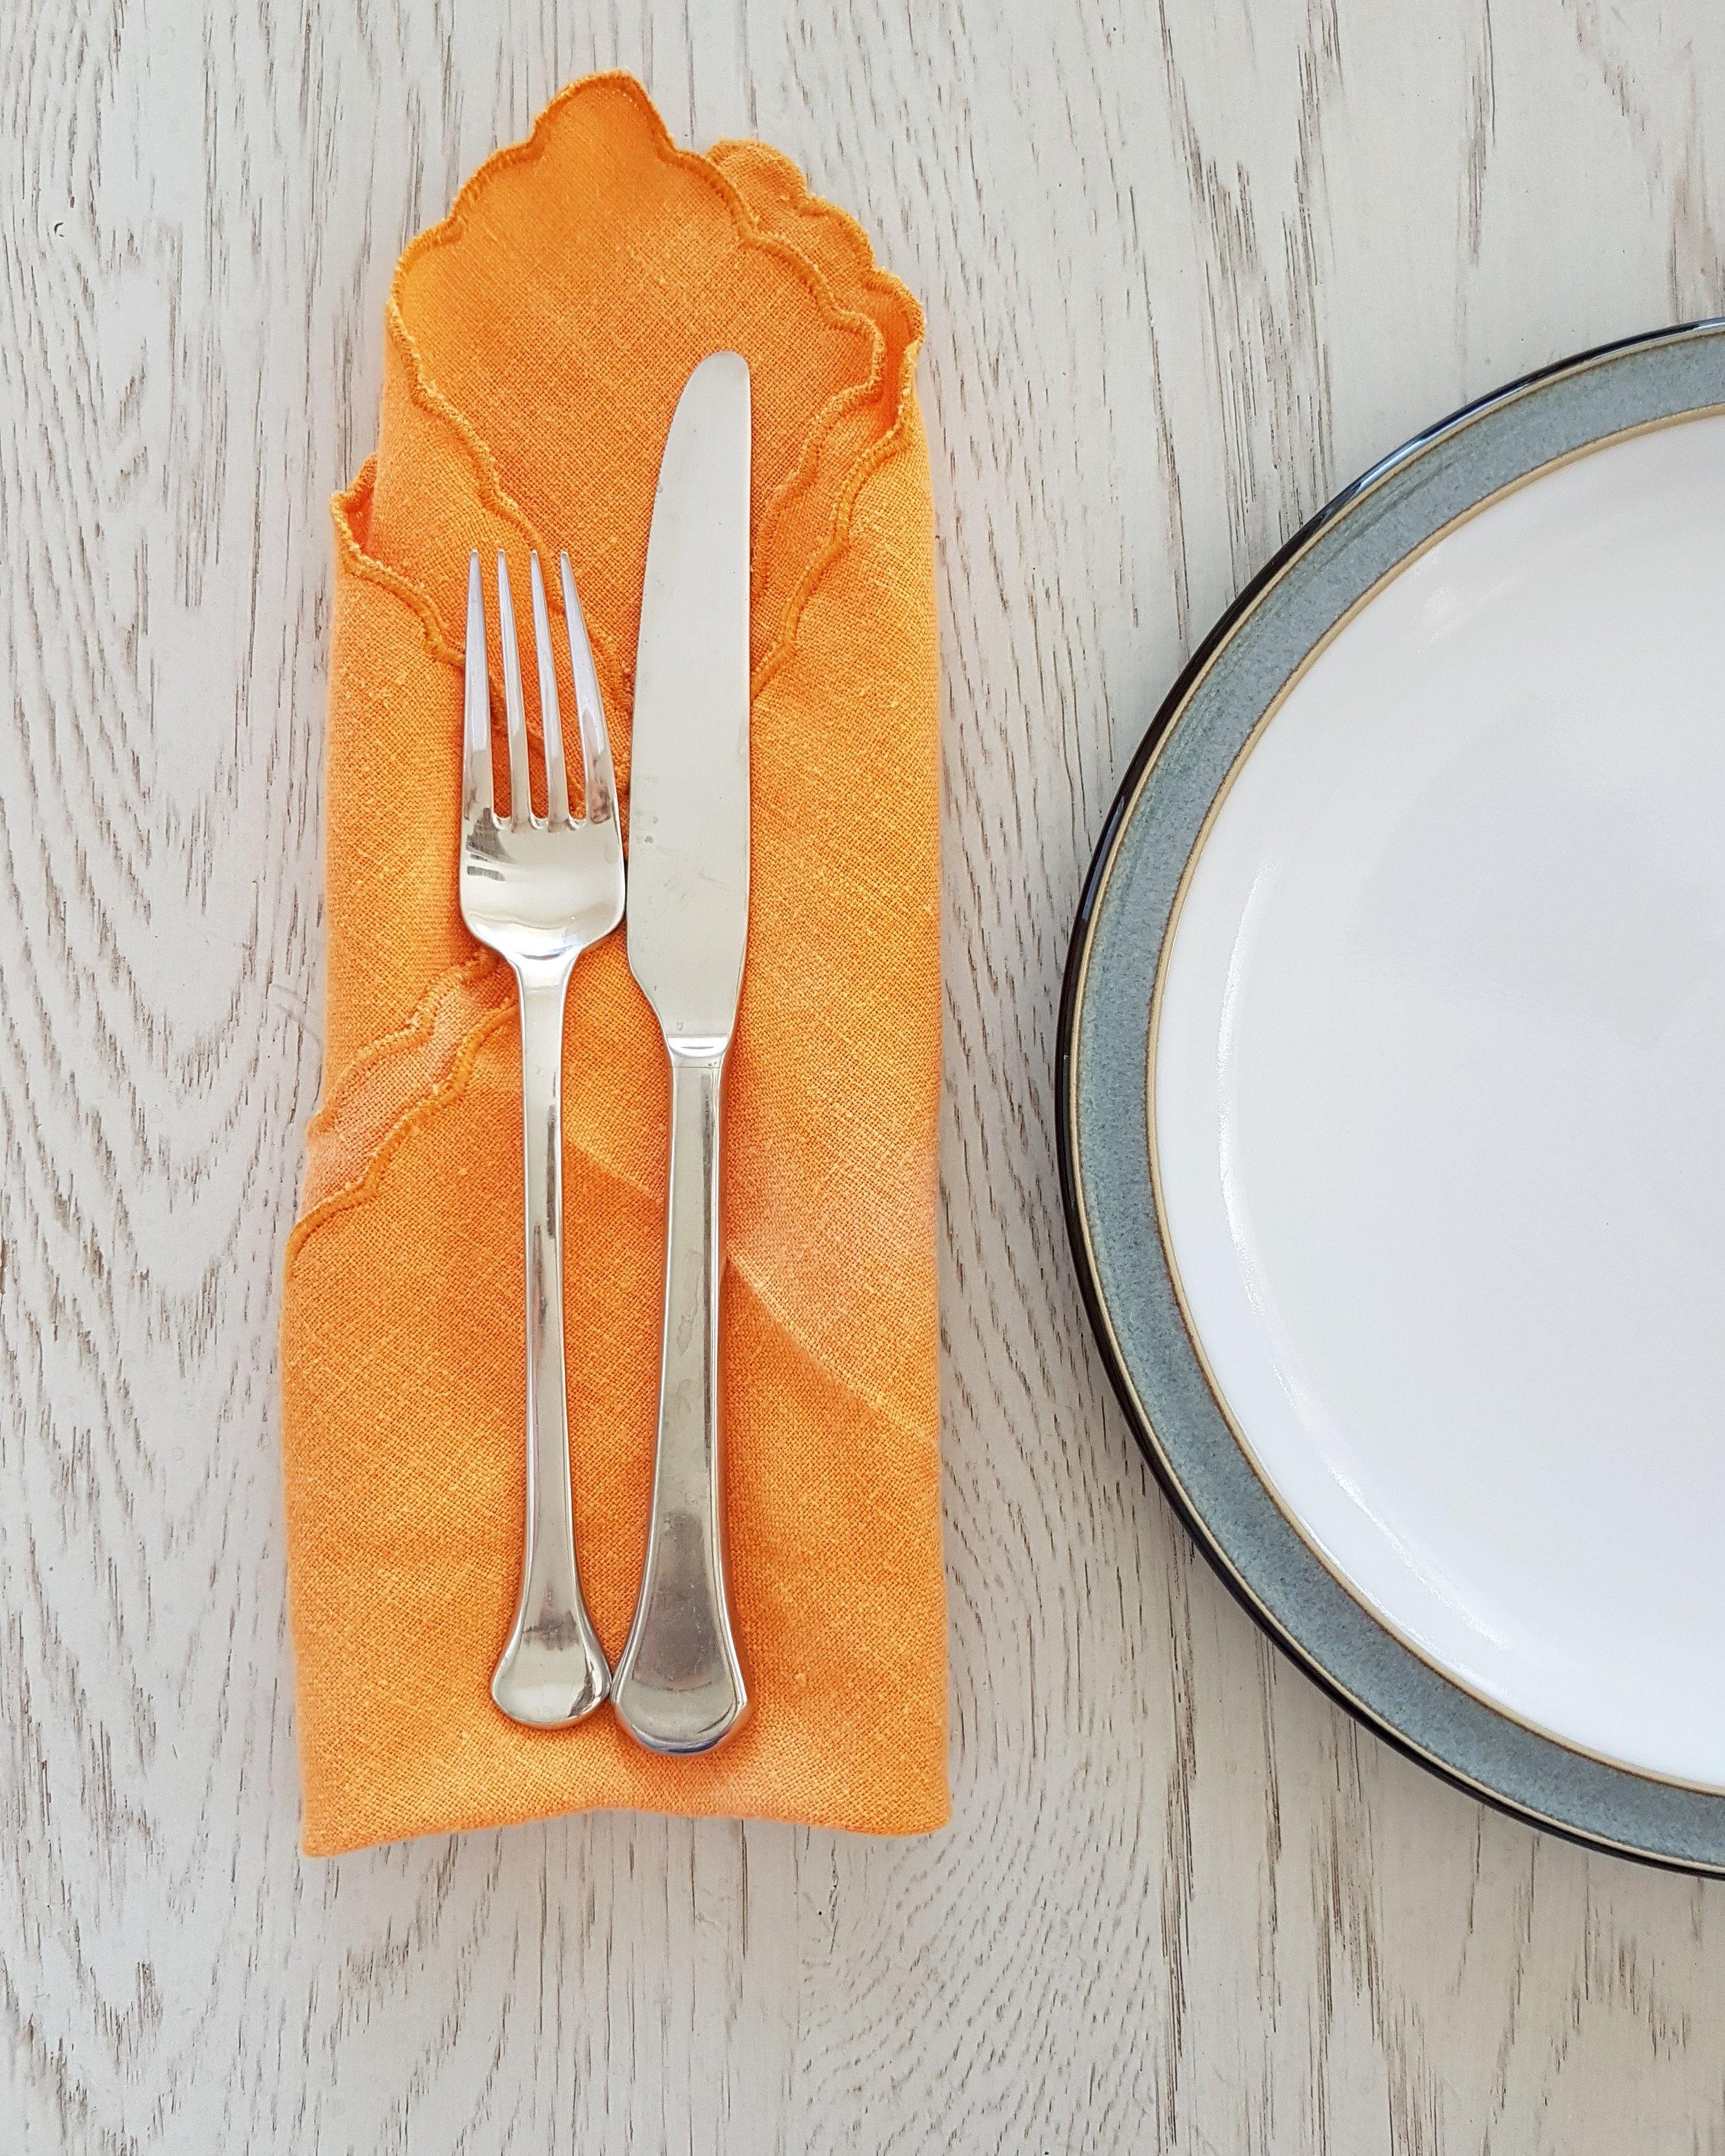 elegant cloth napkins waste less